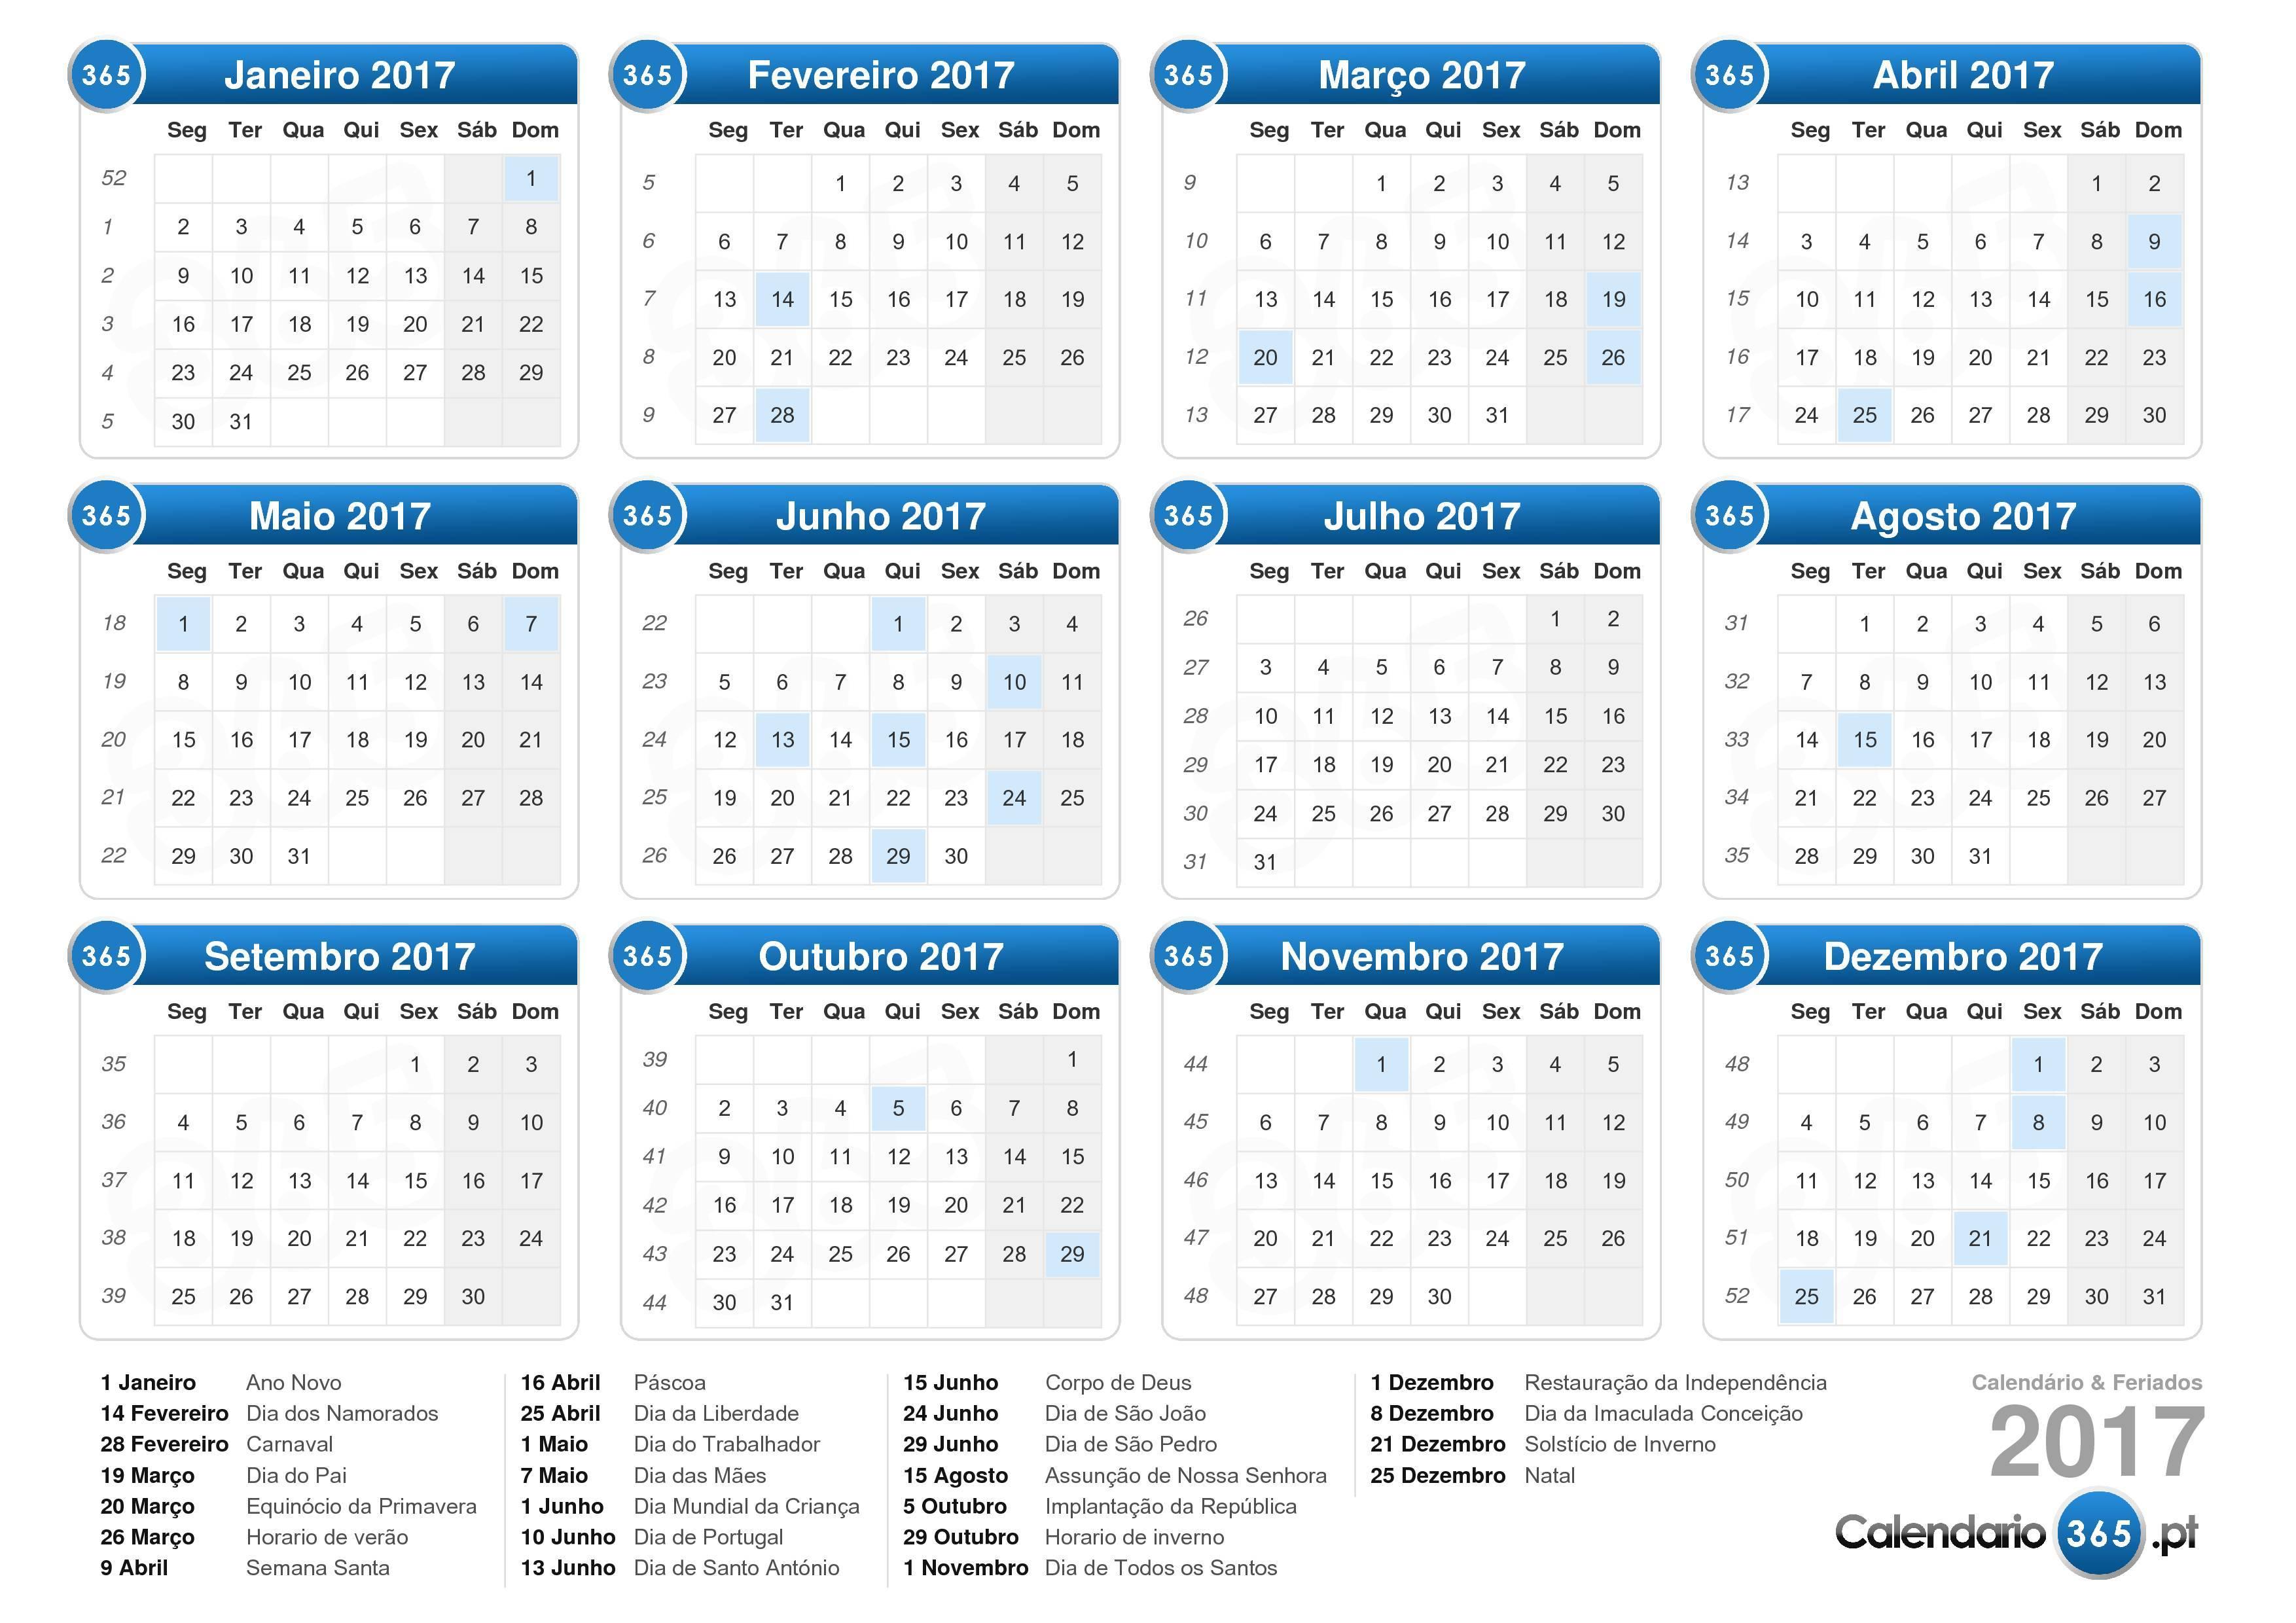 Calend rio 2017 - Calendario 2017 para imprimir por meses ...